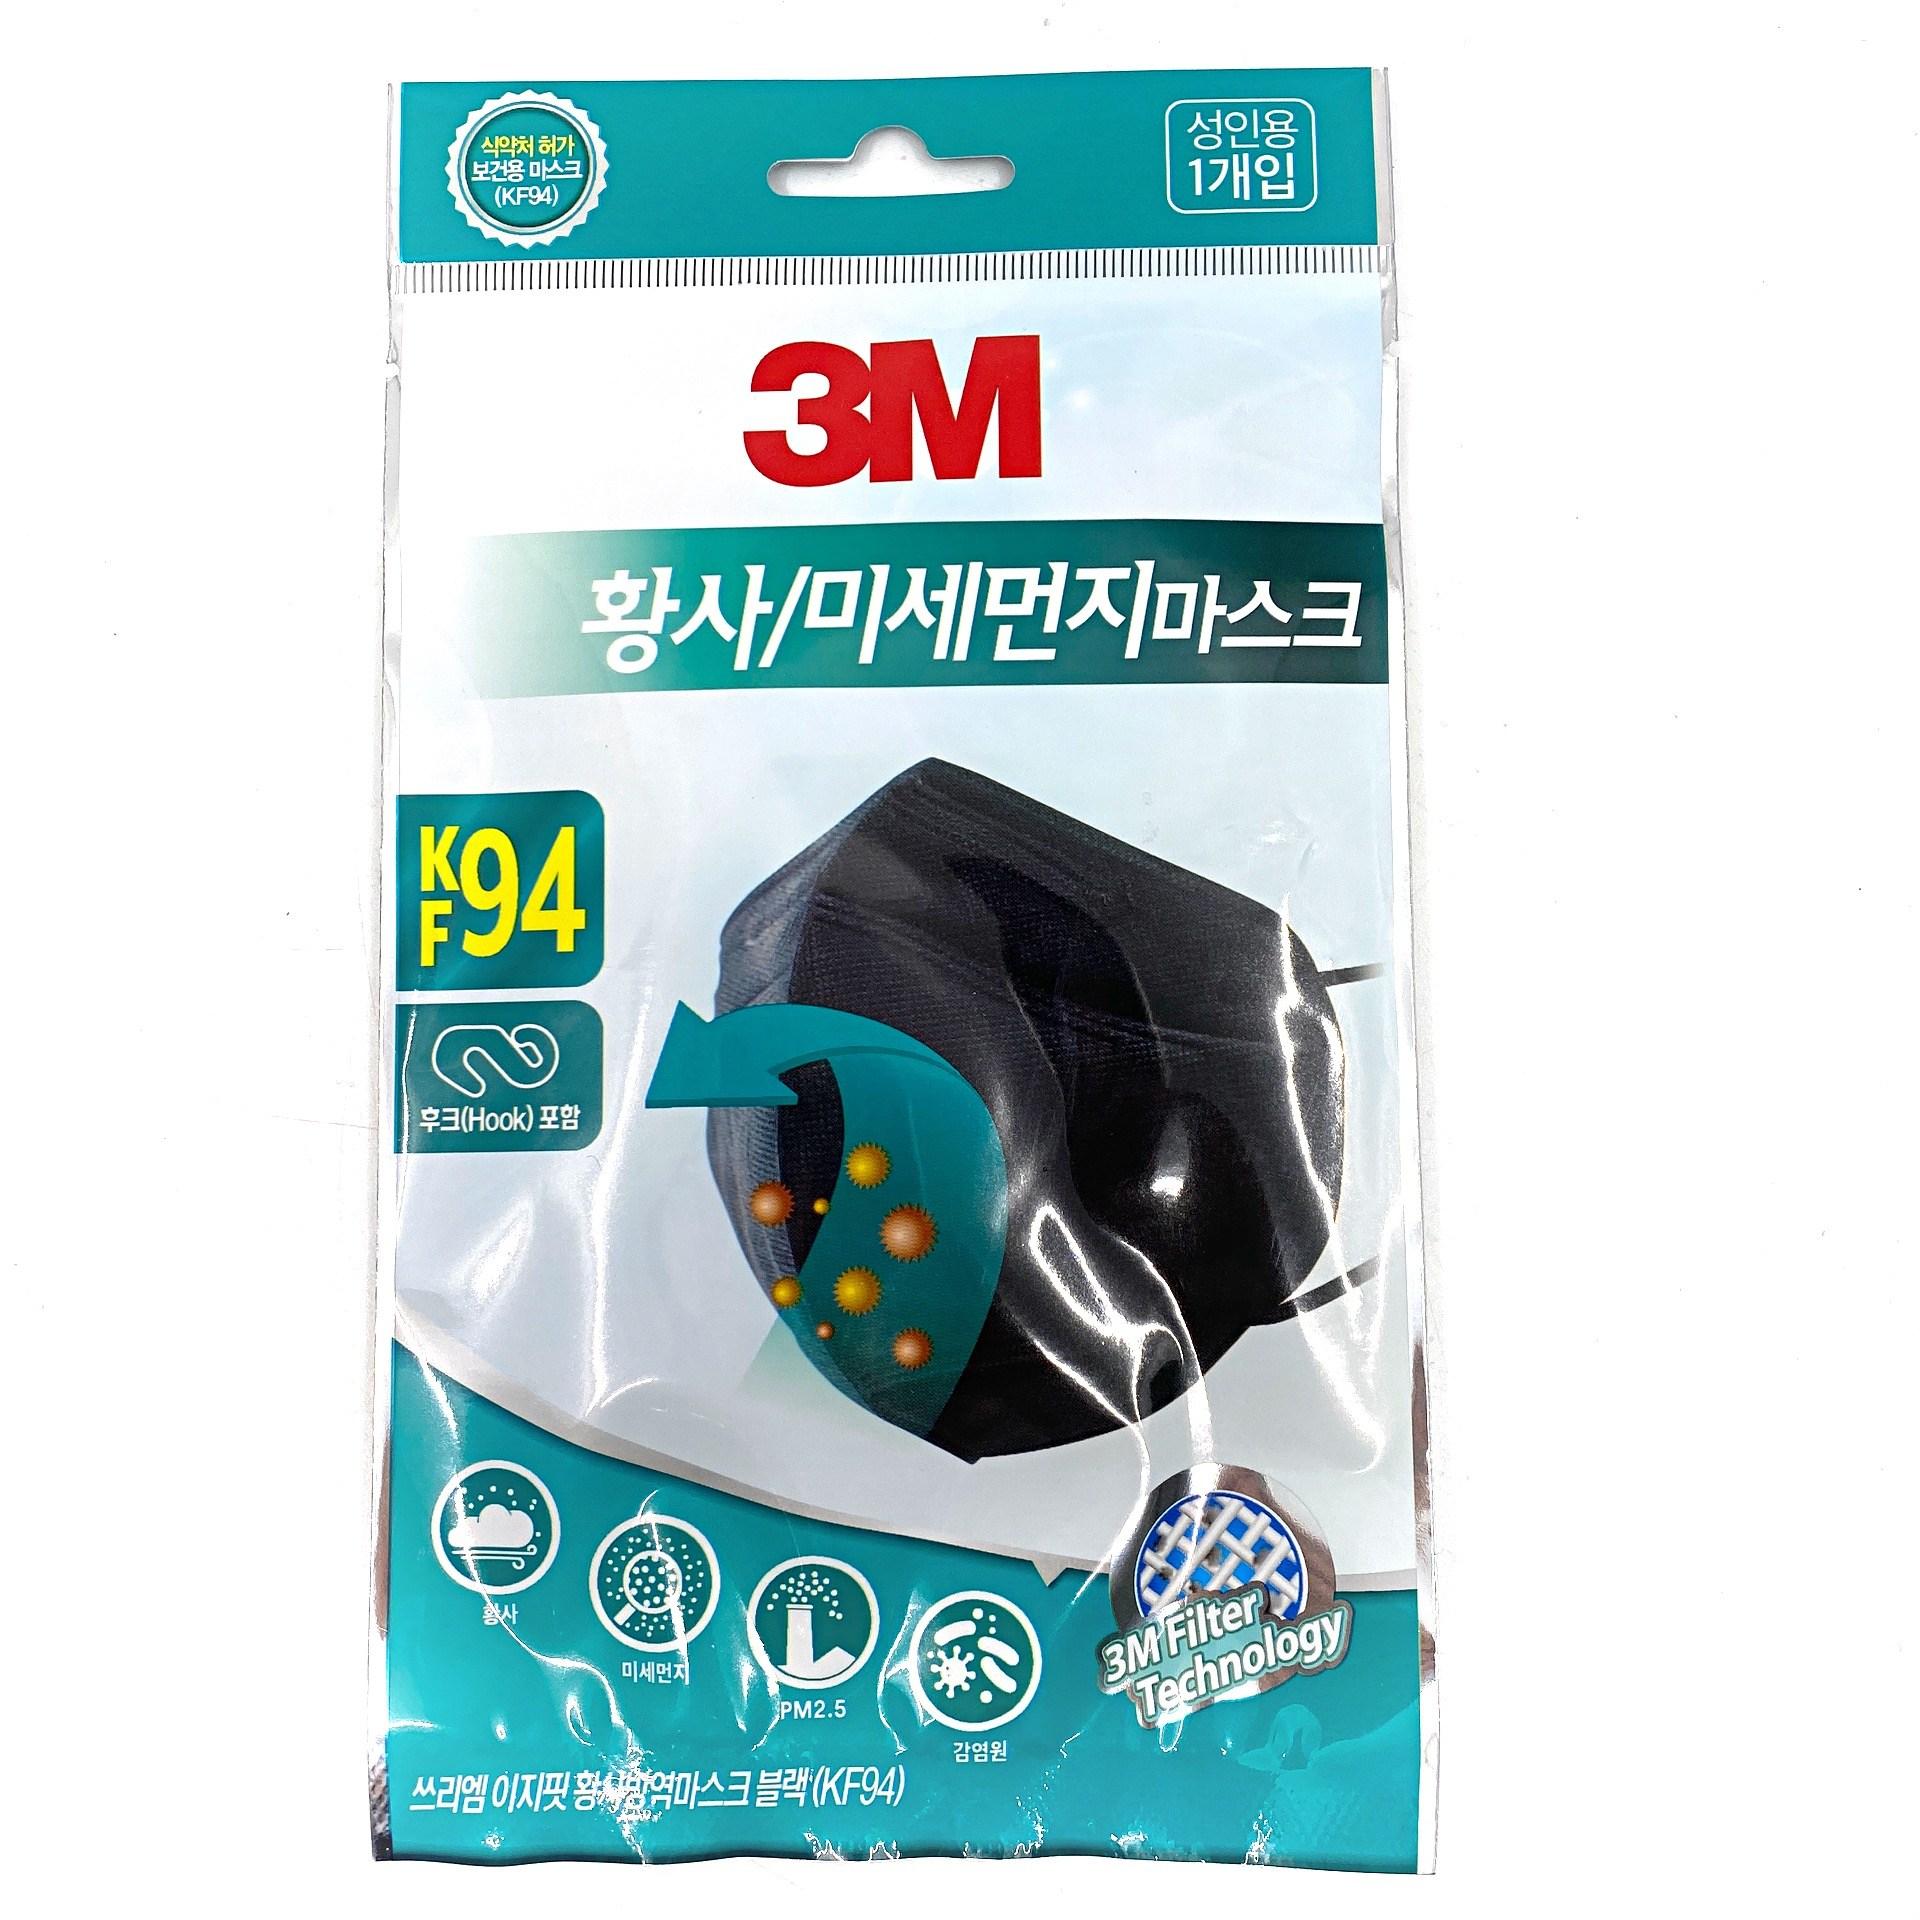 3M 넥스케어 KF94 블랙 대형 이지핏마스크, 1개